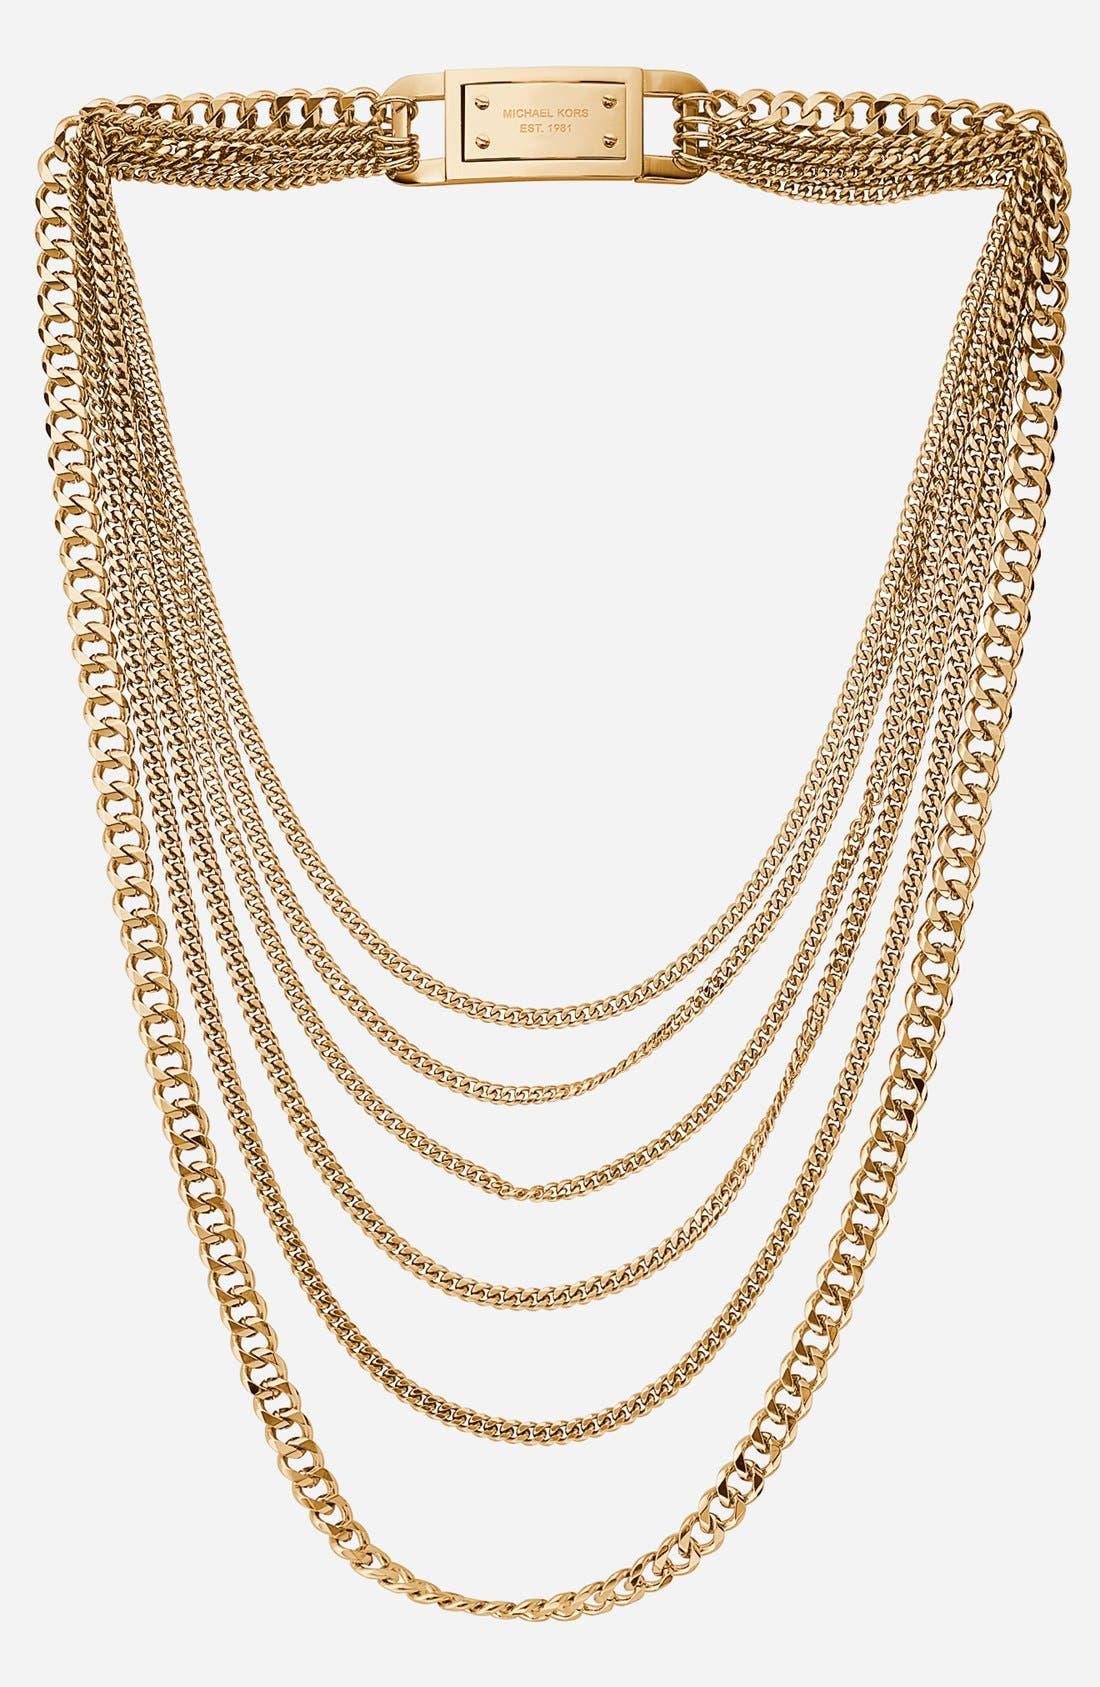 Alternate Image 1 Selected - Michael Kors Multistrand Link Necklace